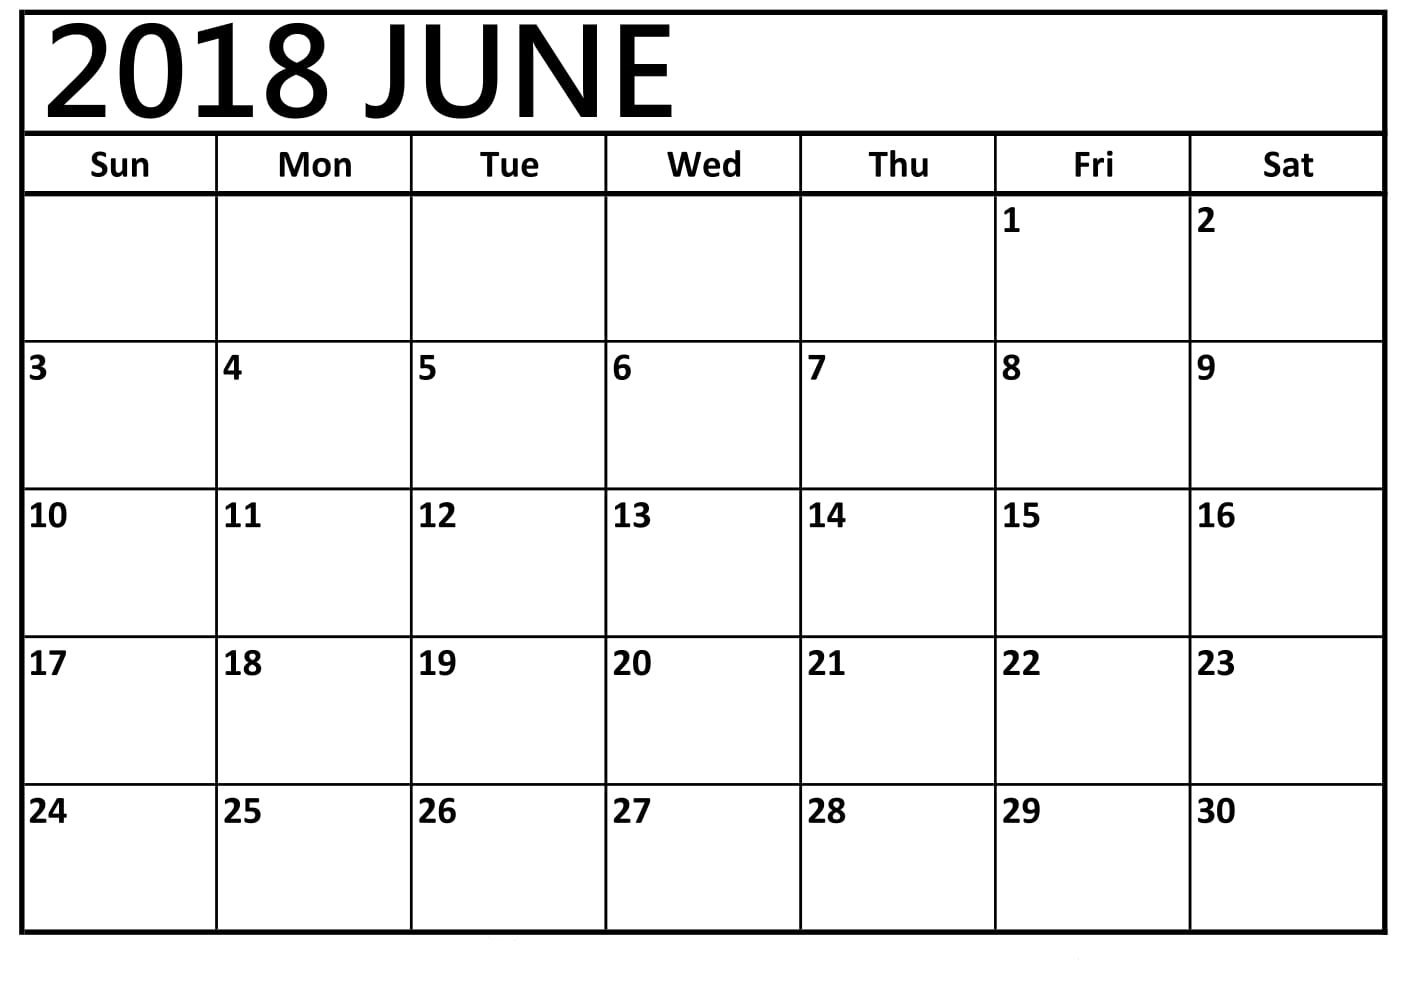 [%June 2018 Printable Calendar | [Free]* Printable Calendar 2018 Templates|Blank Calendar June 18|Blank Calendar June 18%]